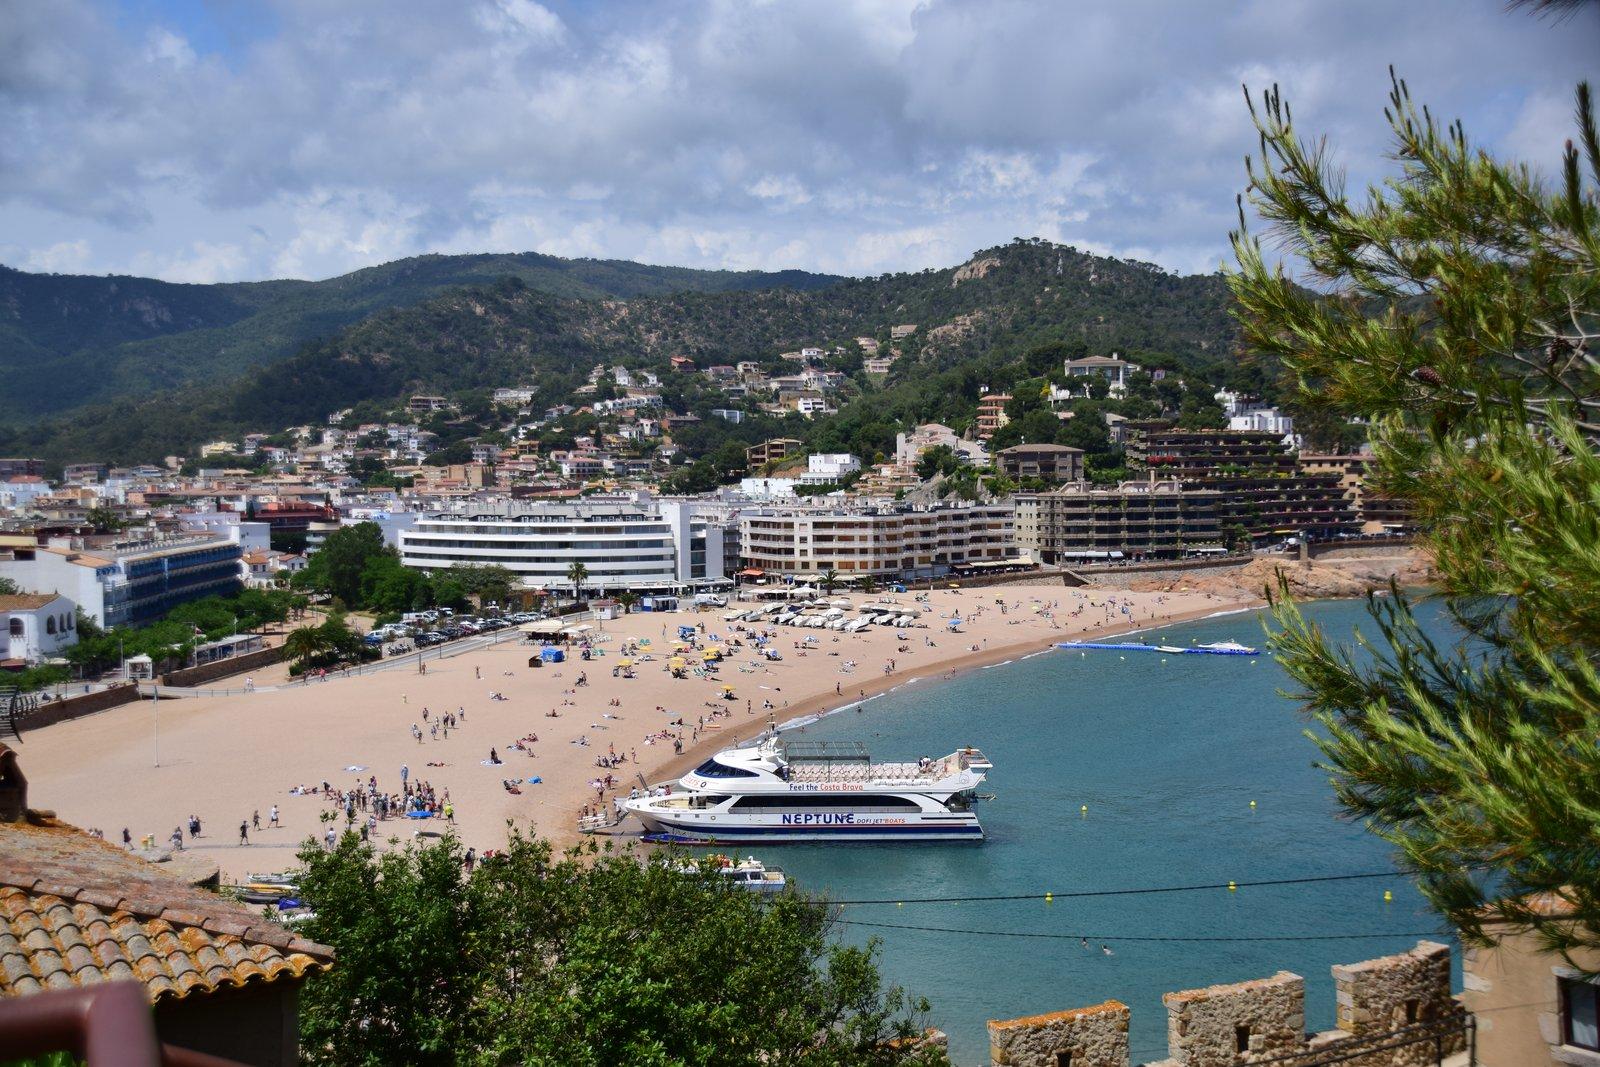 Strand in Tossa de Mar